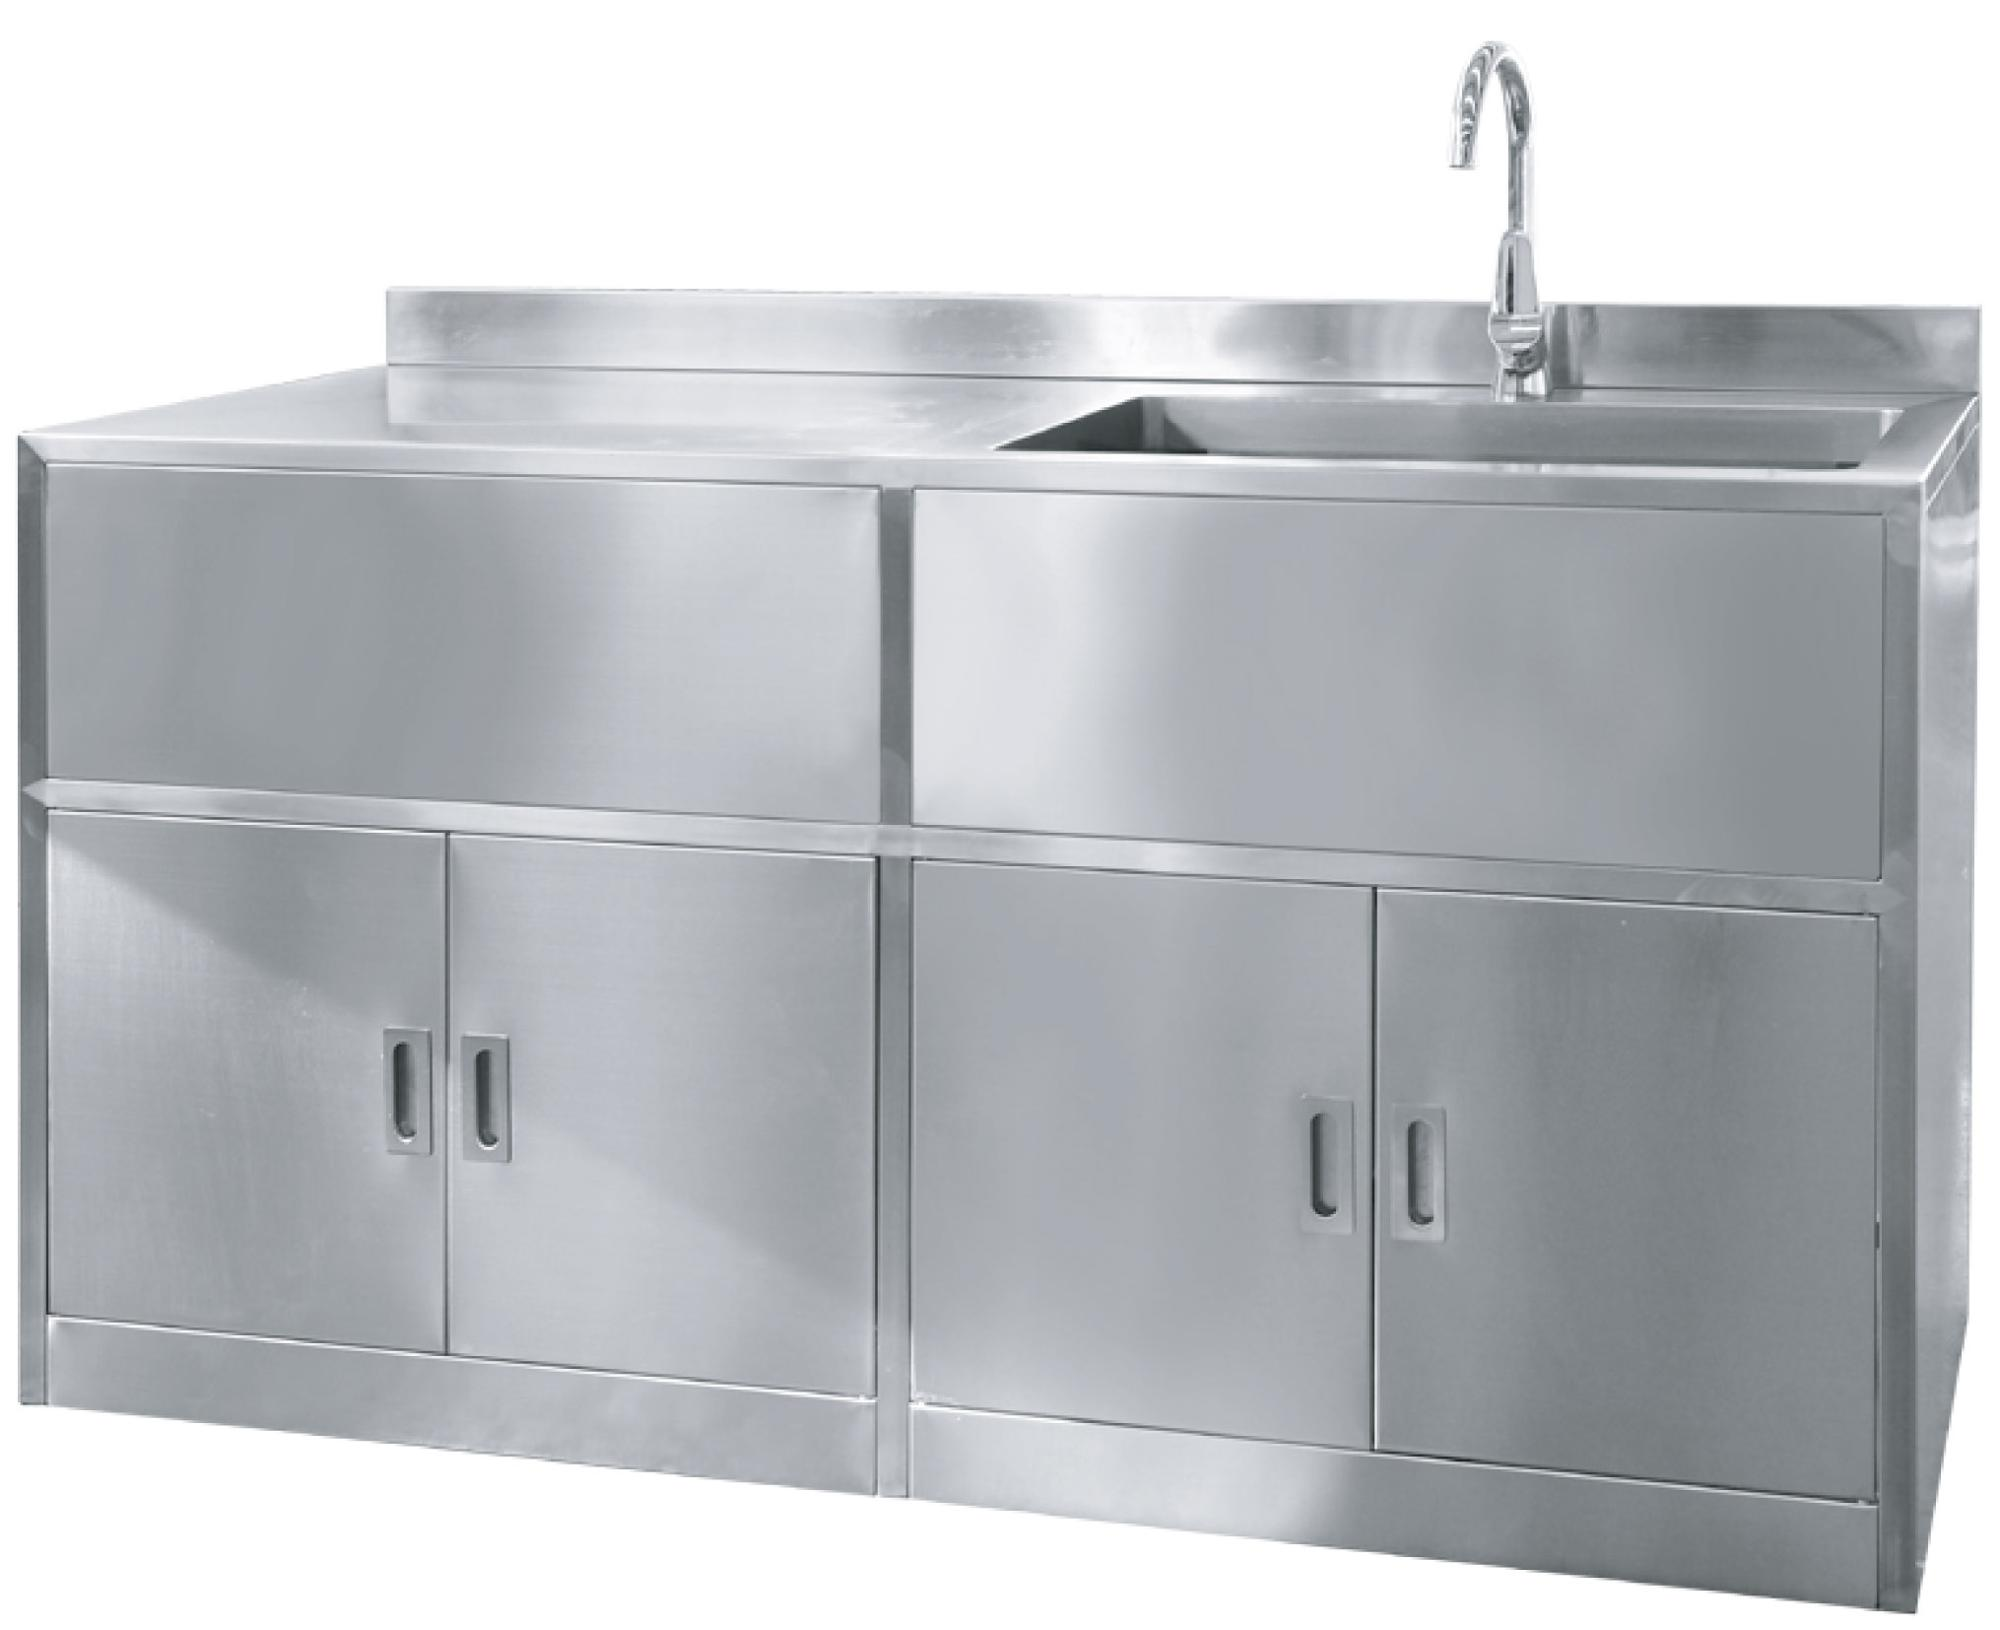 Stainless Steel Kitchen Sink Cabinet Scrub Unit Buy Free